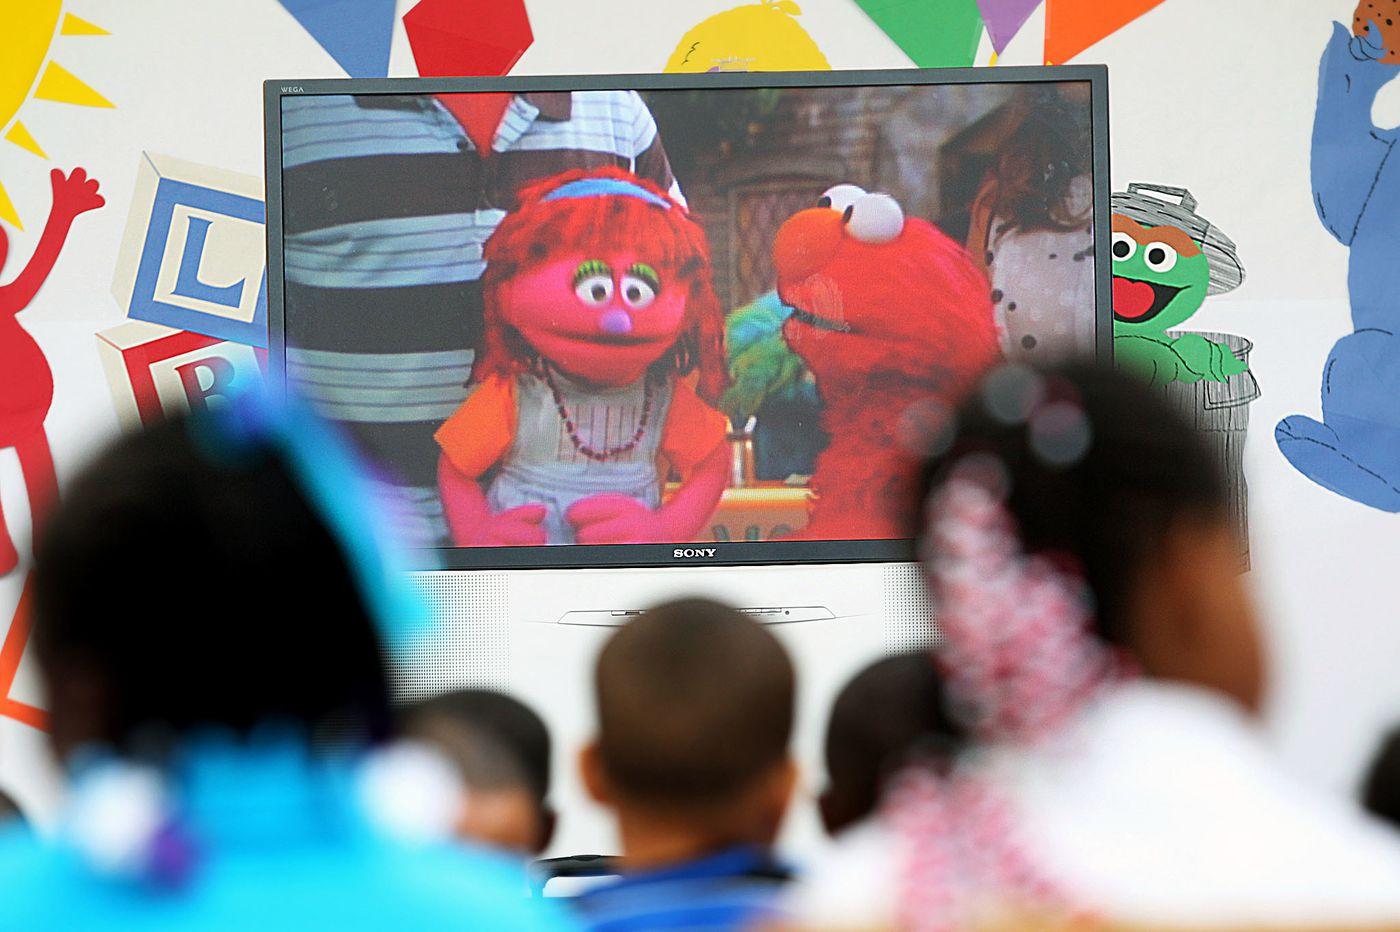 'Sesame Street' uses Muppet to address child homelessness